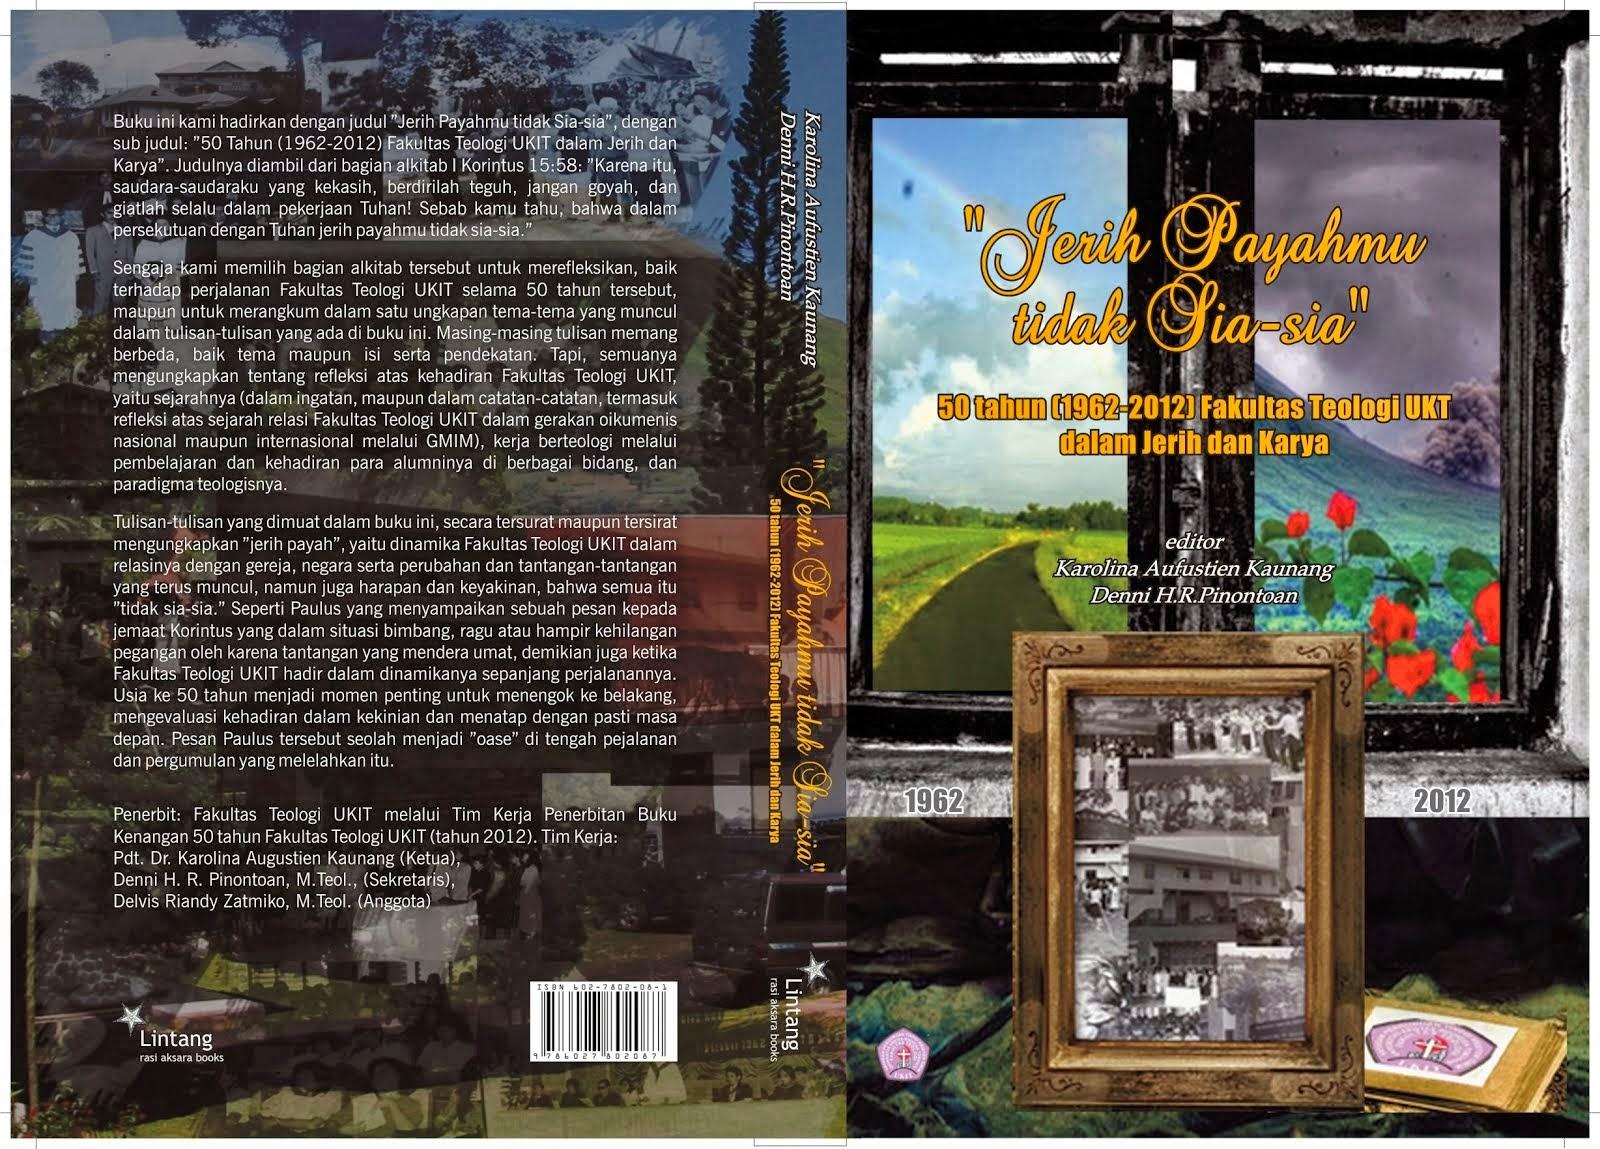 Buku Terbitan Fakultas Teologi UKIT